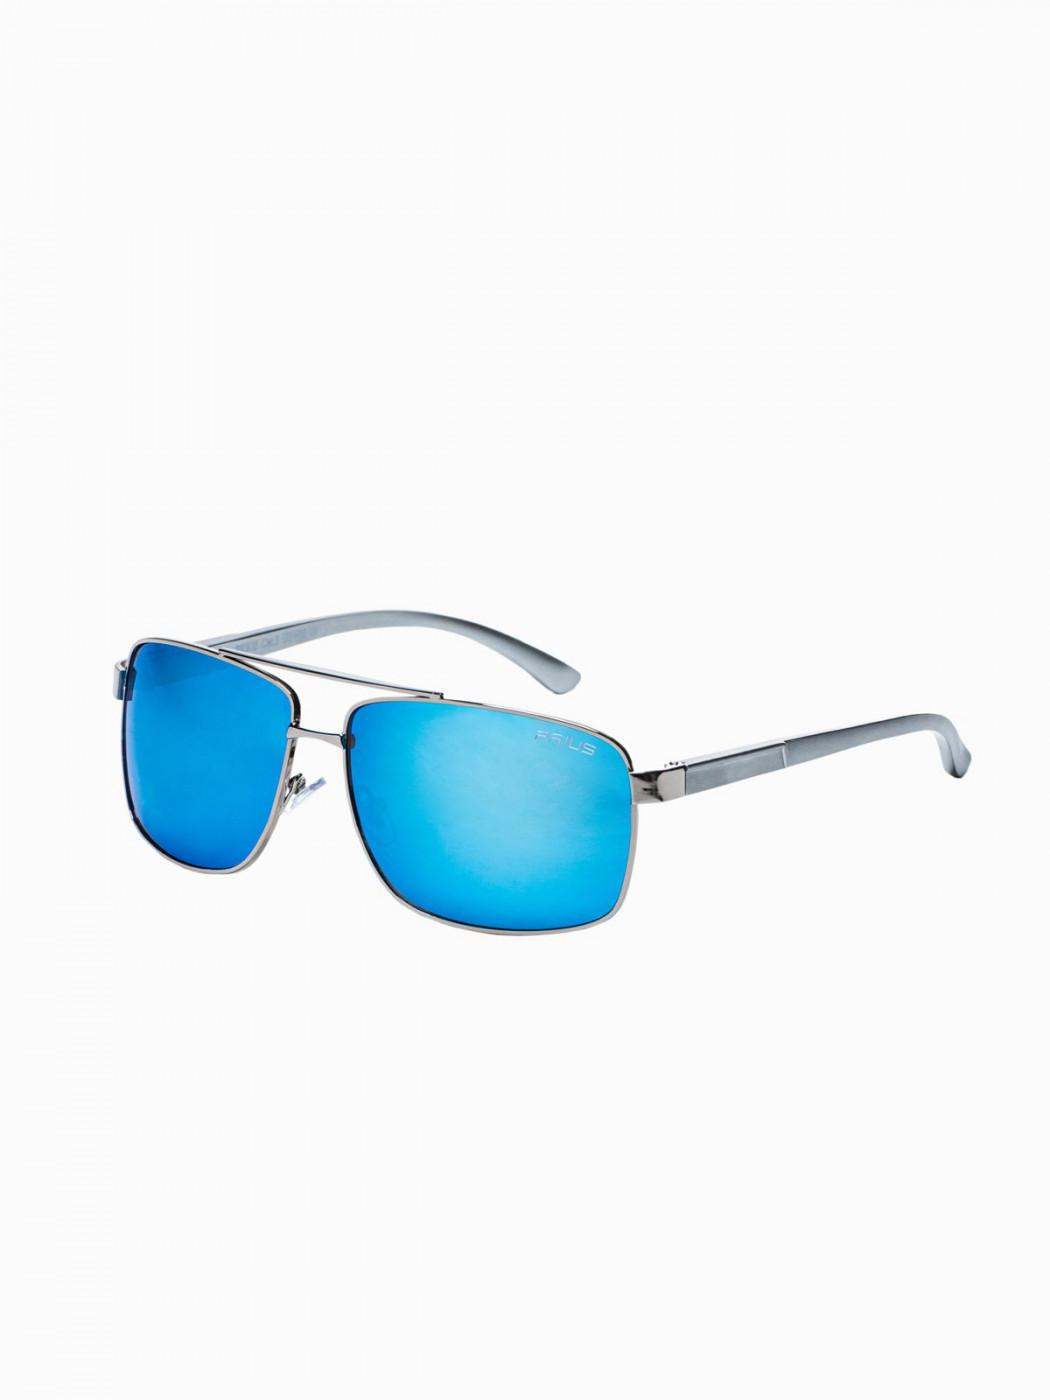 Sunglasses A280 - blue